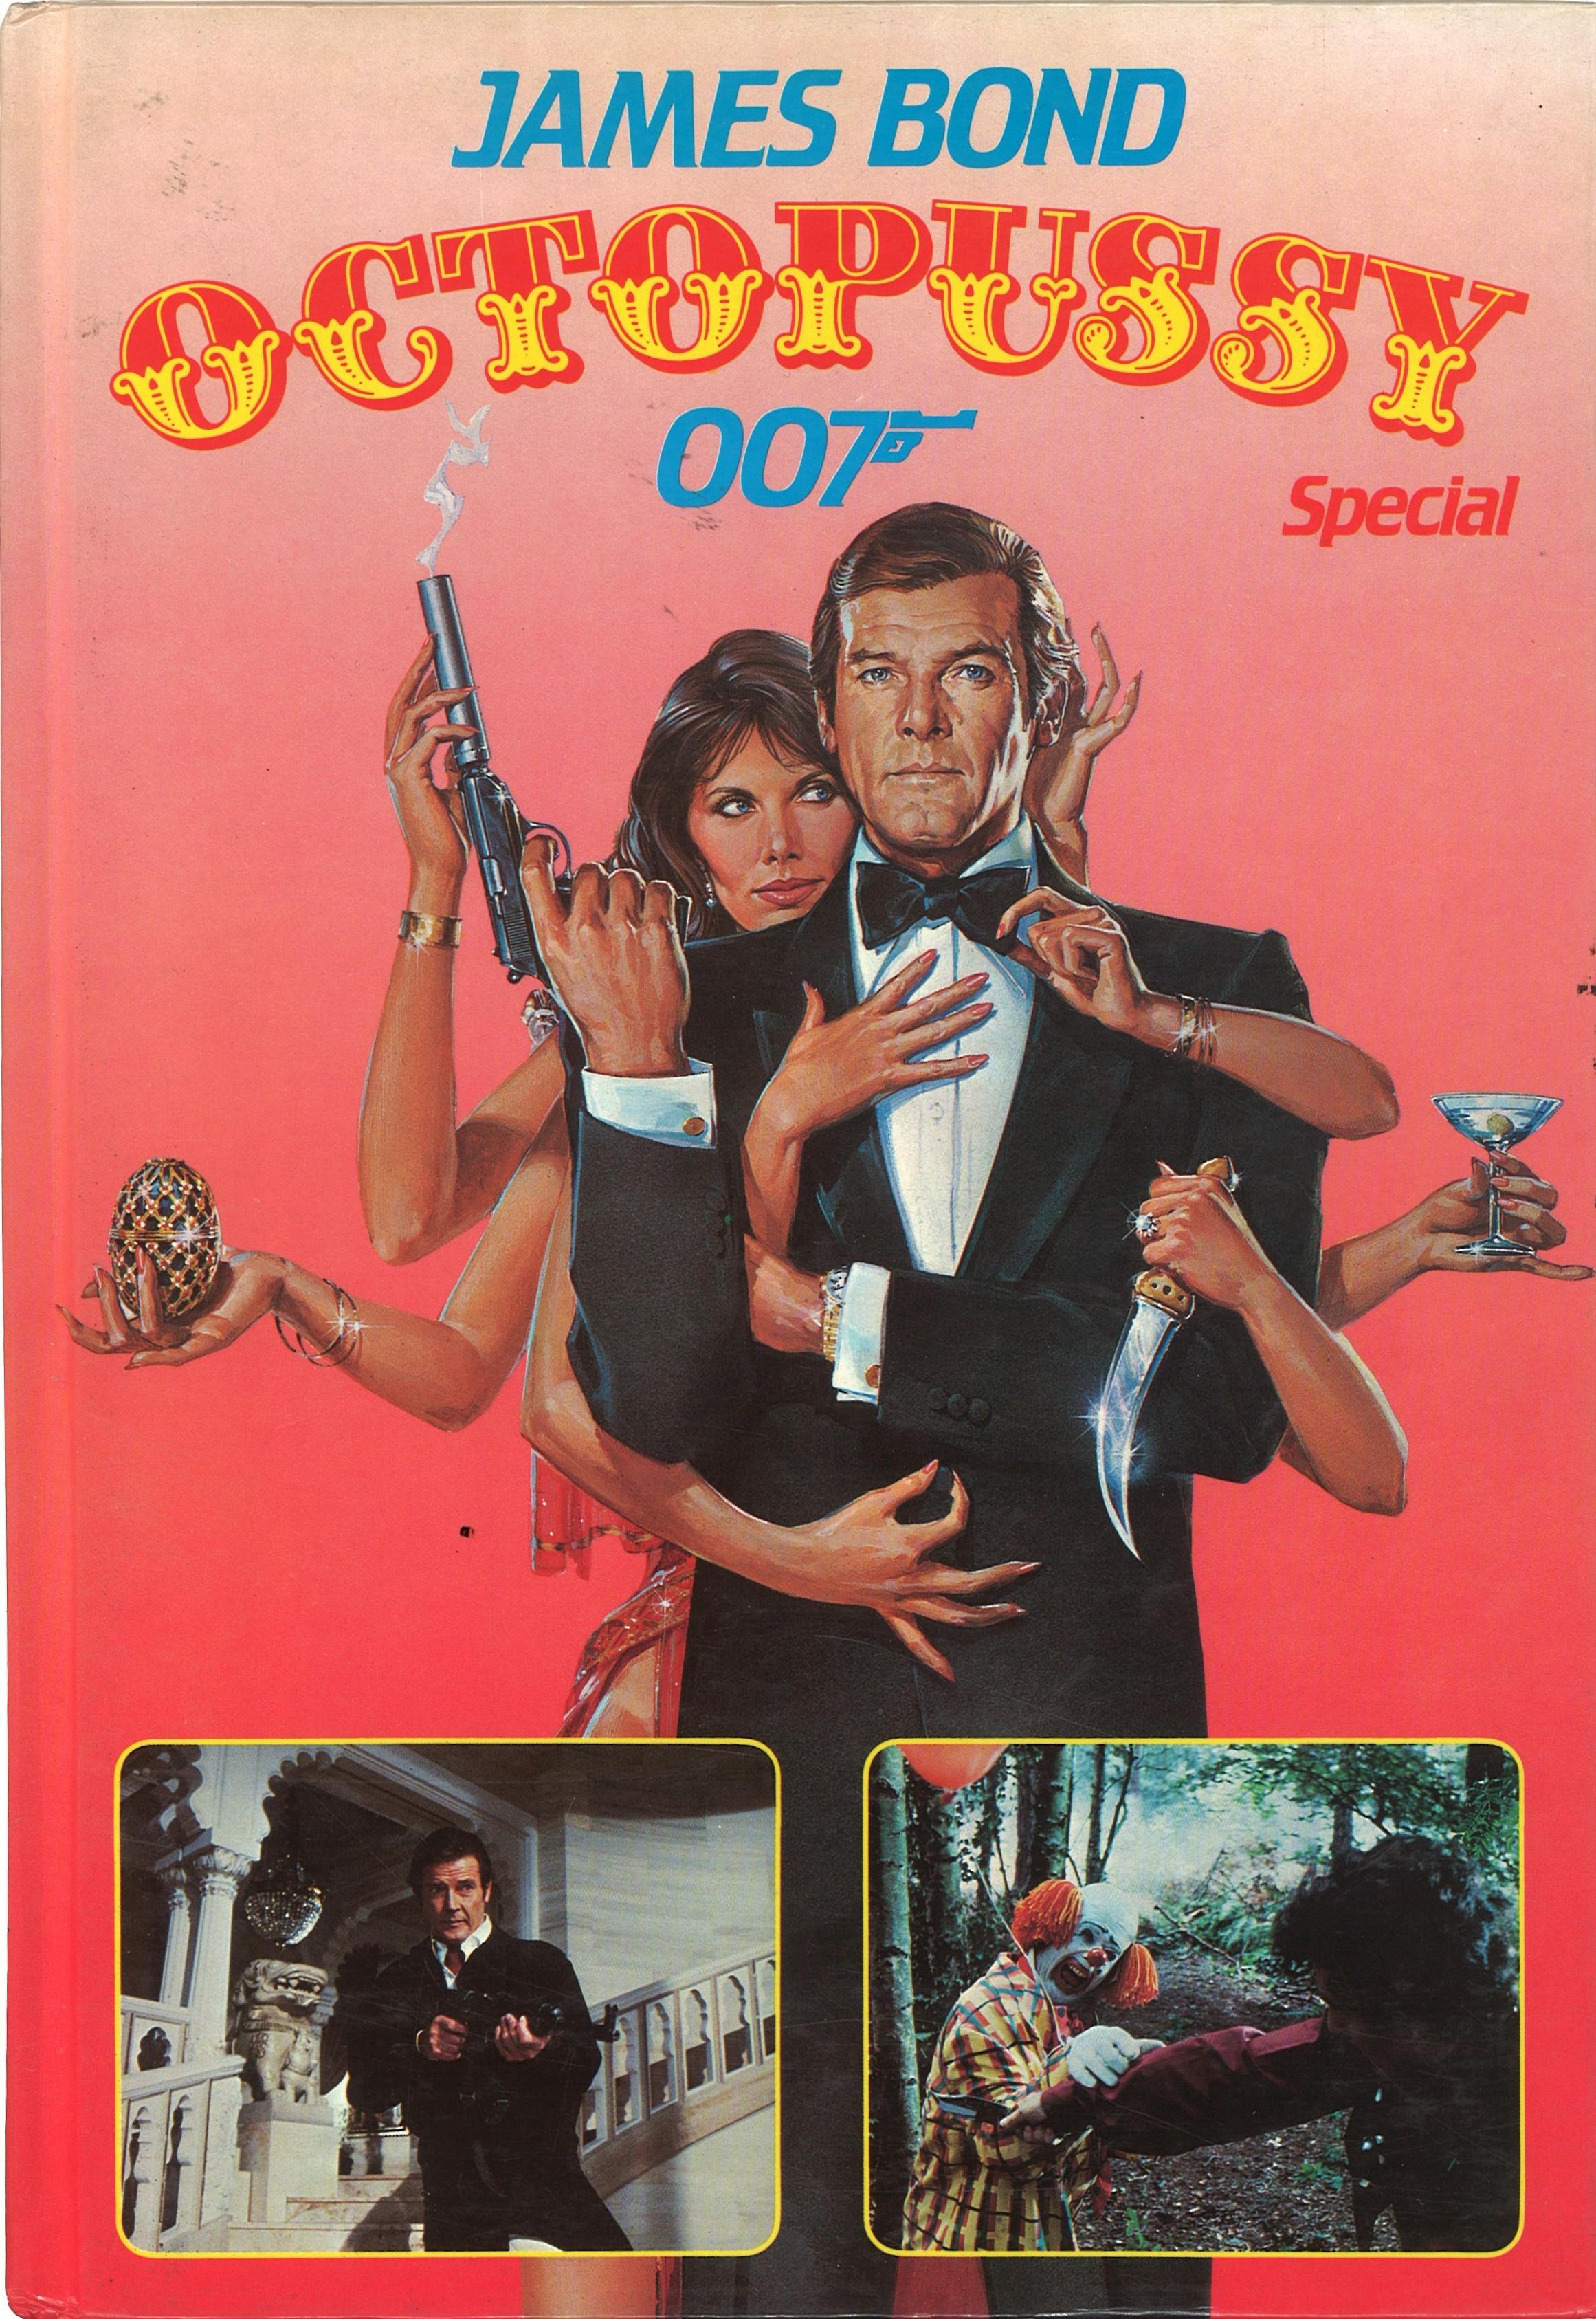 James Bond Octopussy 007 Special